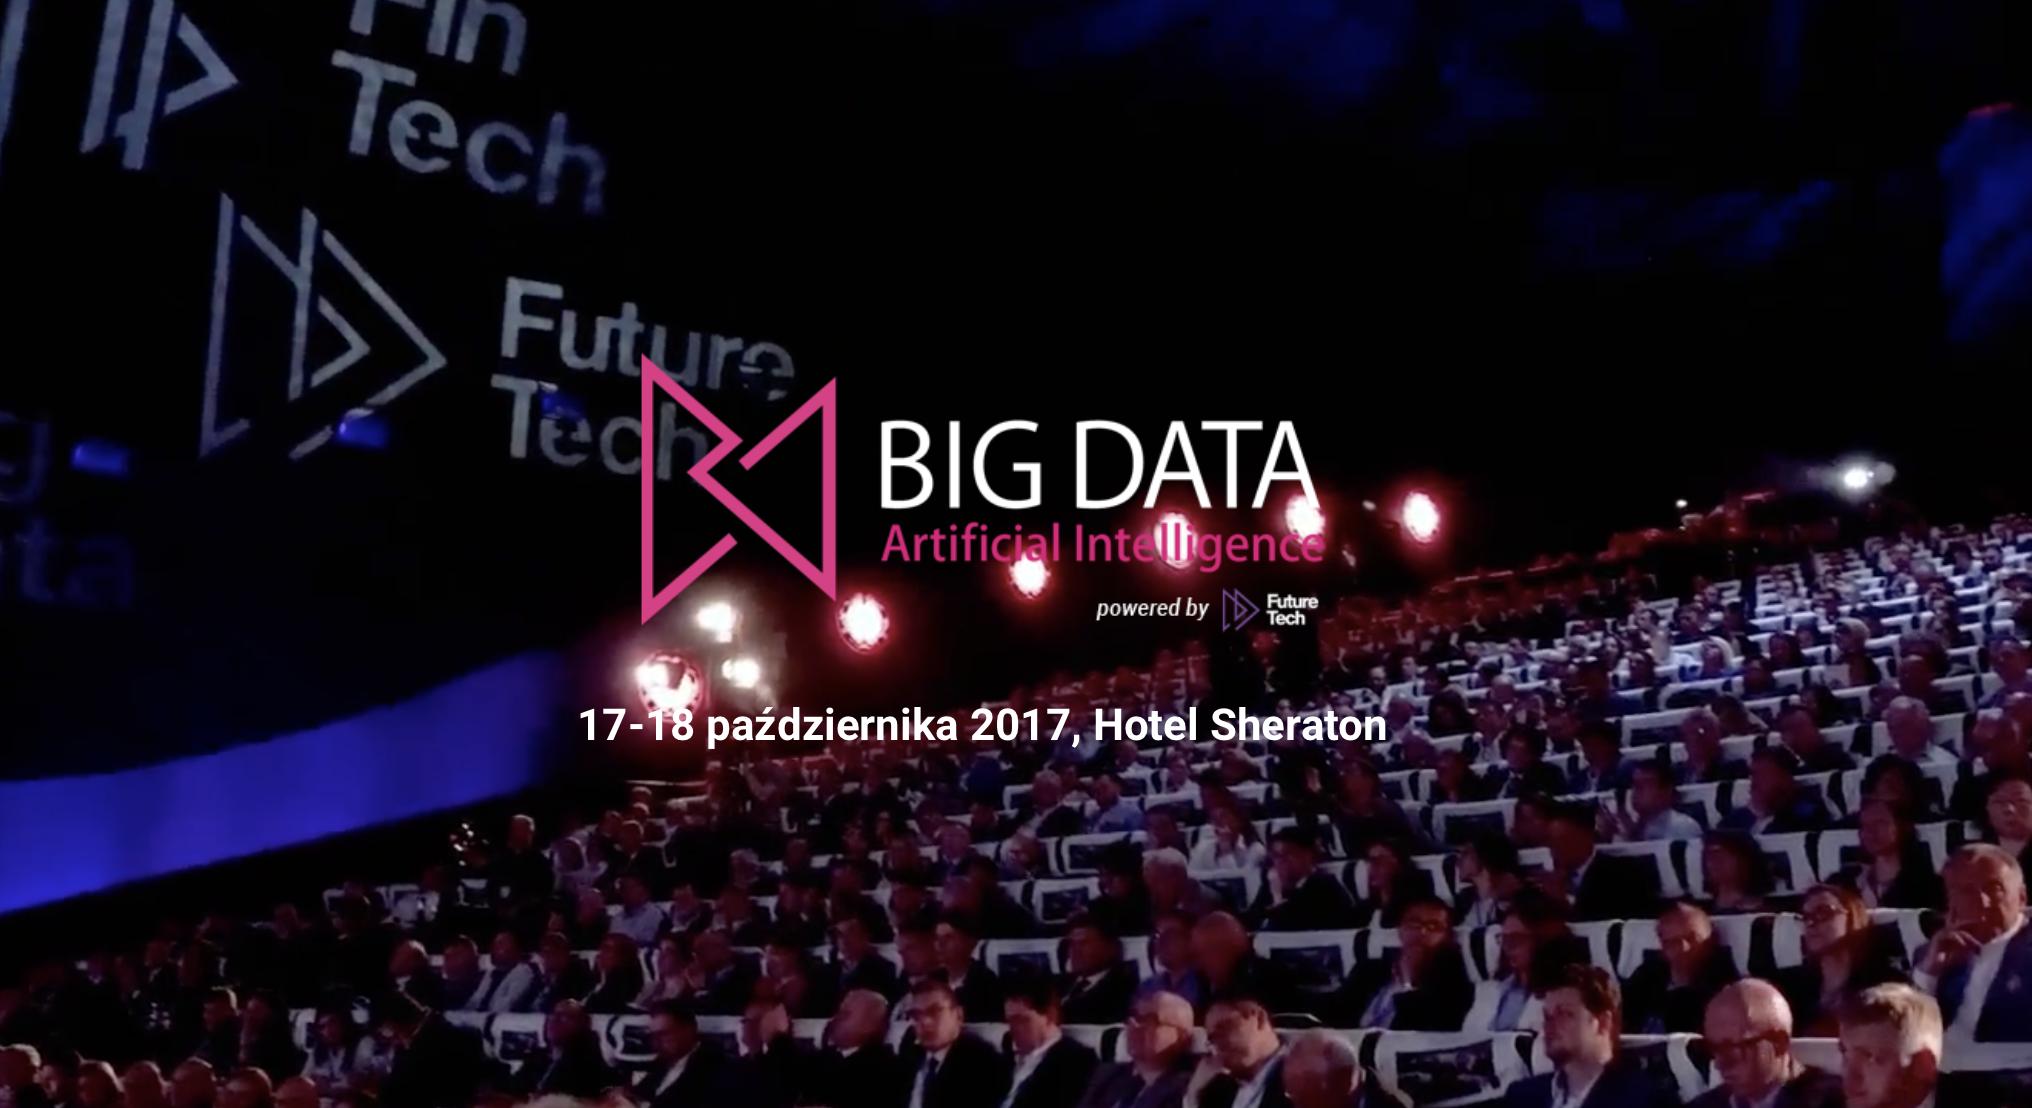 BigData AI conference Norbert Biedrzycki